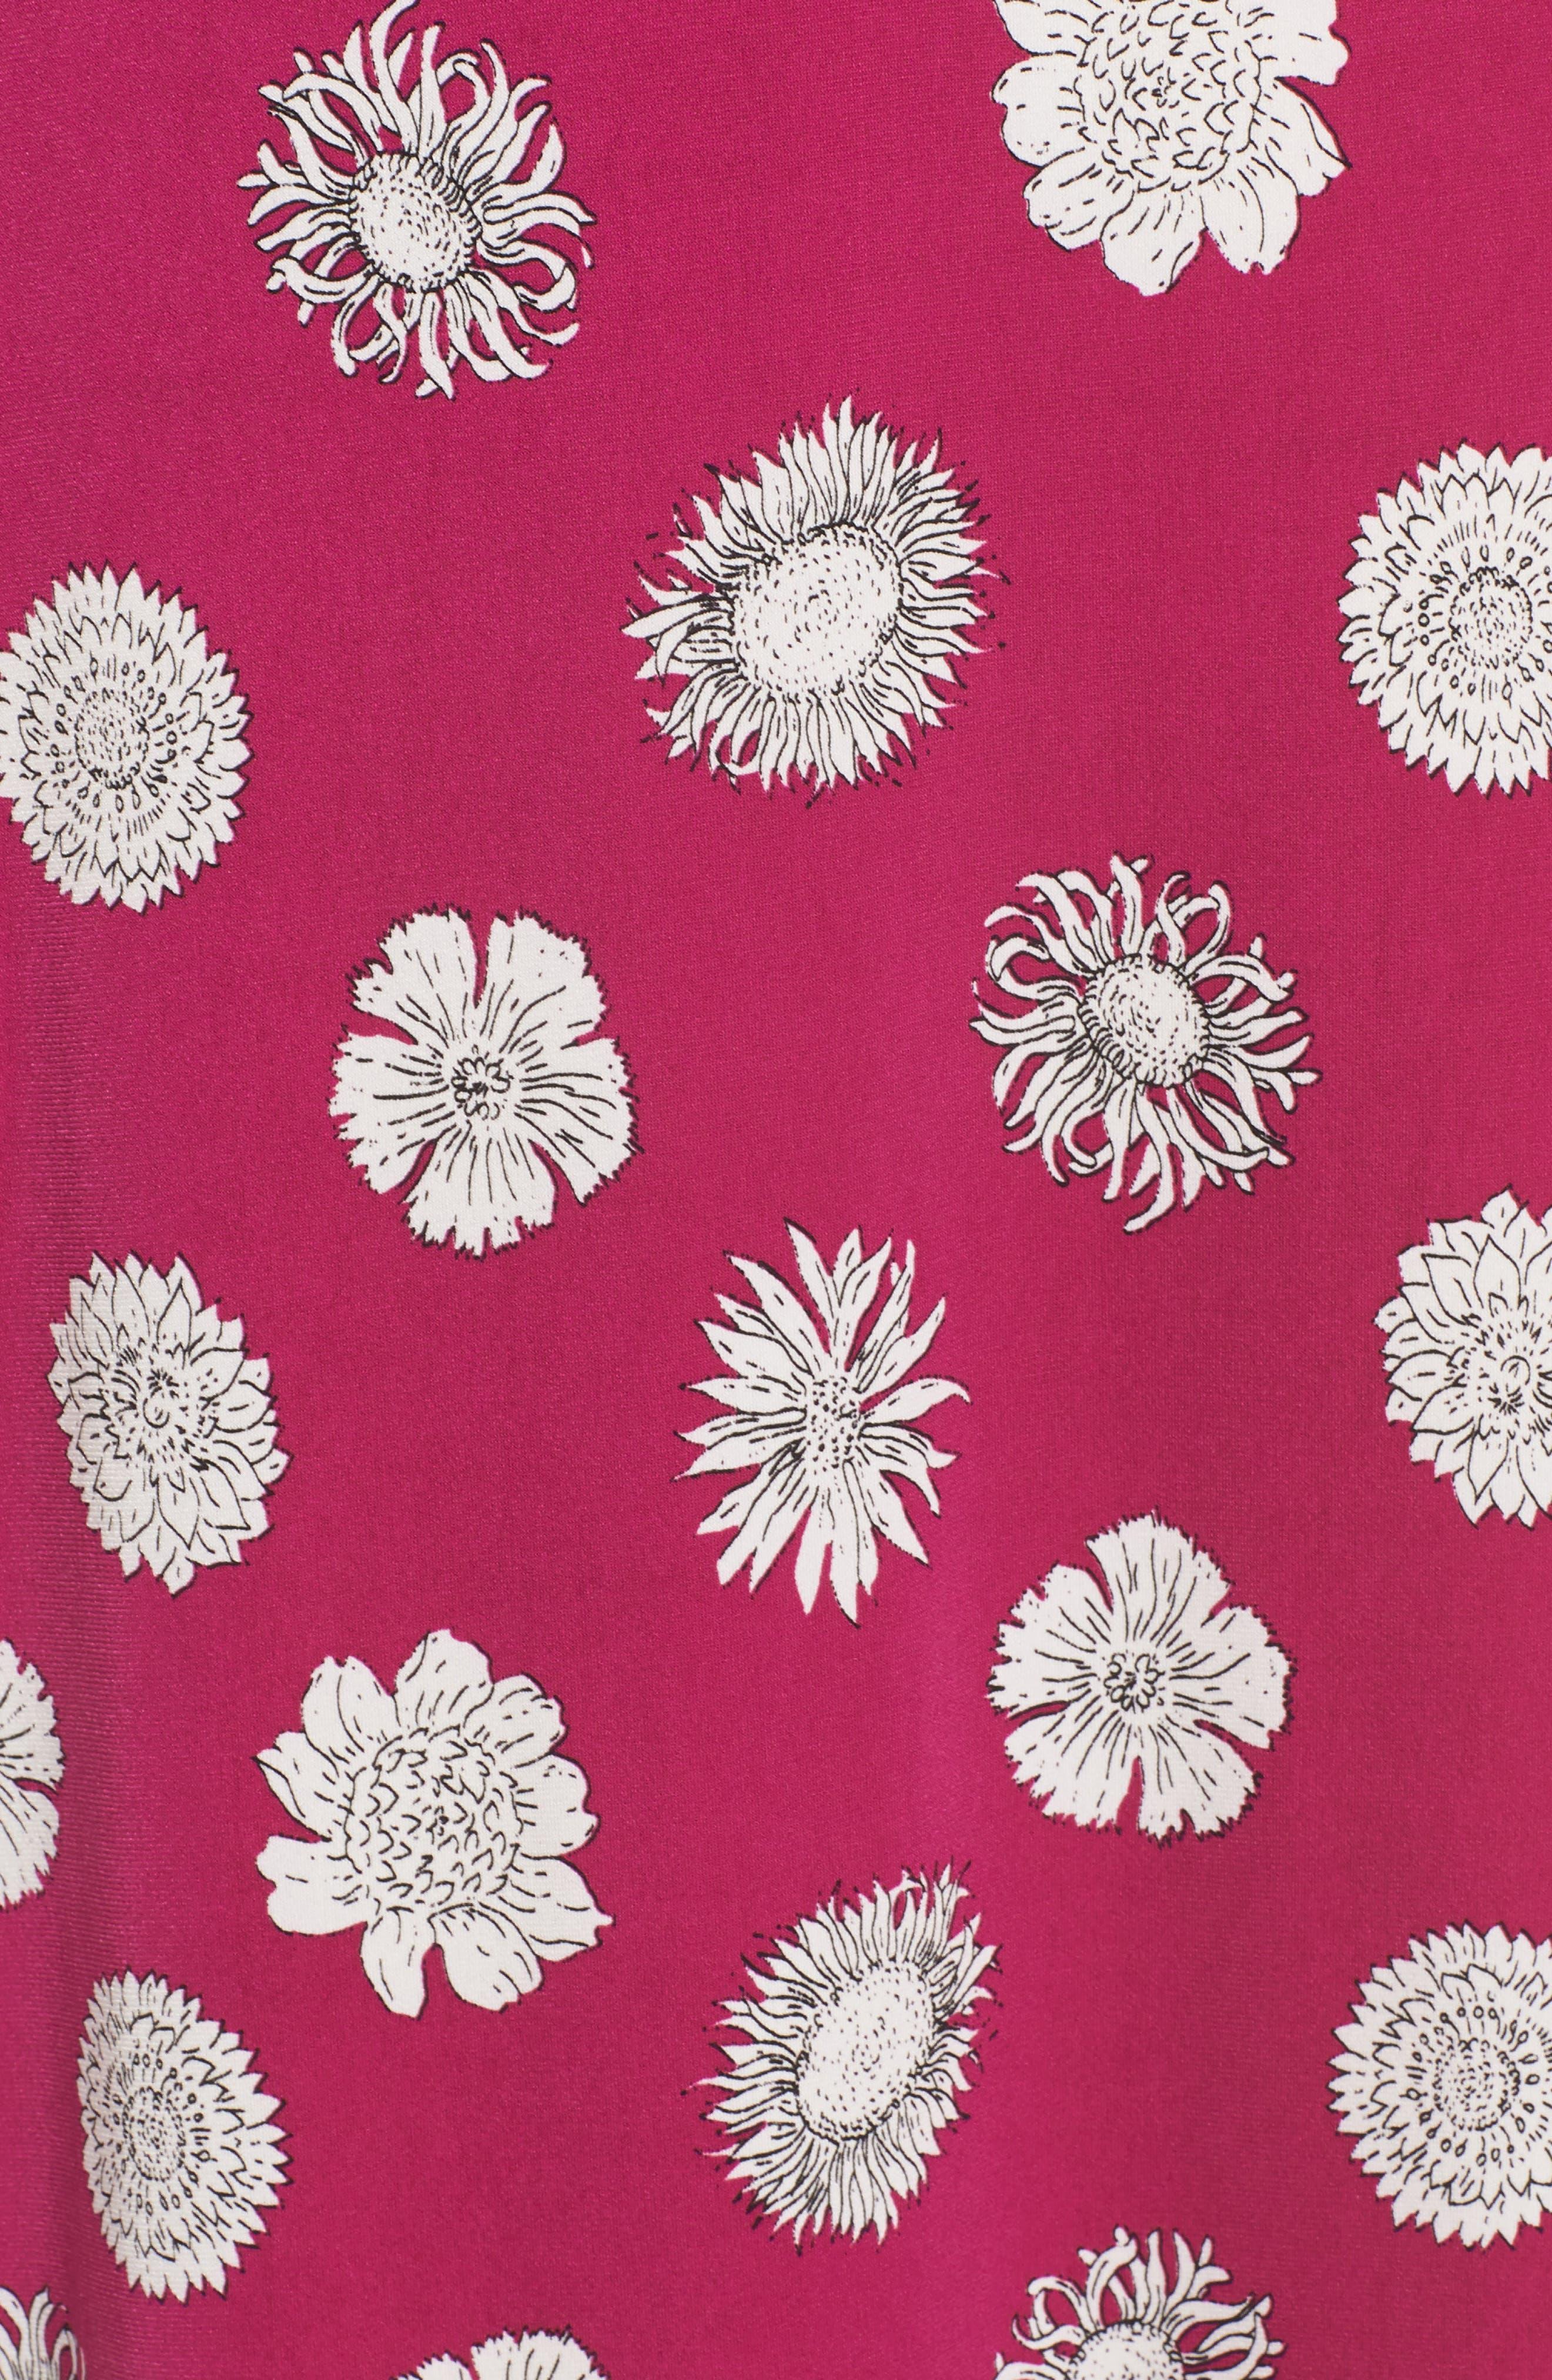 Botanical Tropics Halter Maxi Dress,                             Alternate thumbnail 11, color,